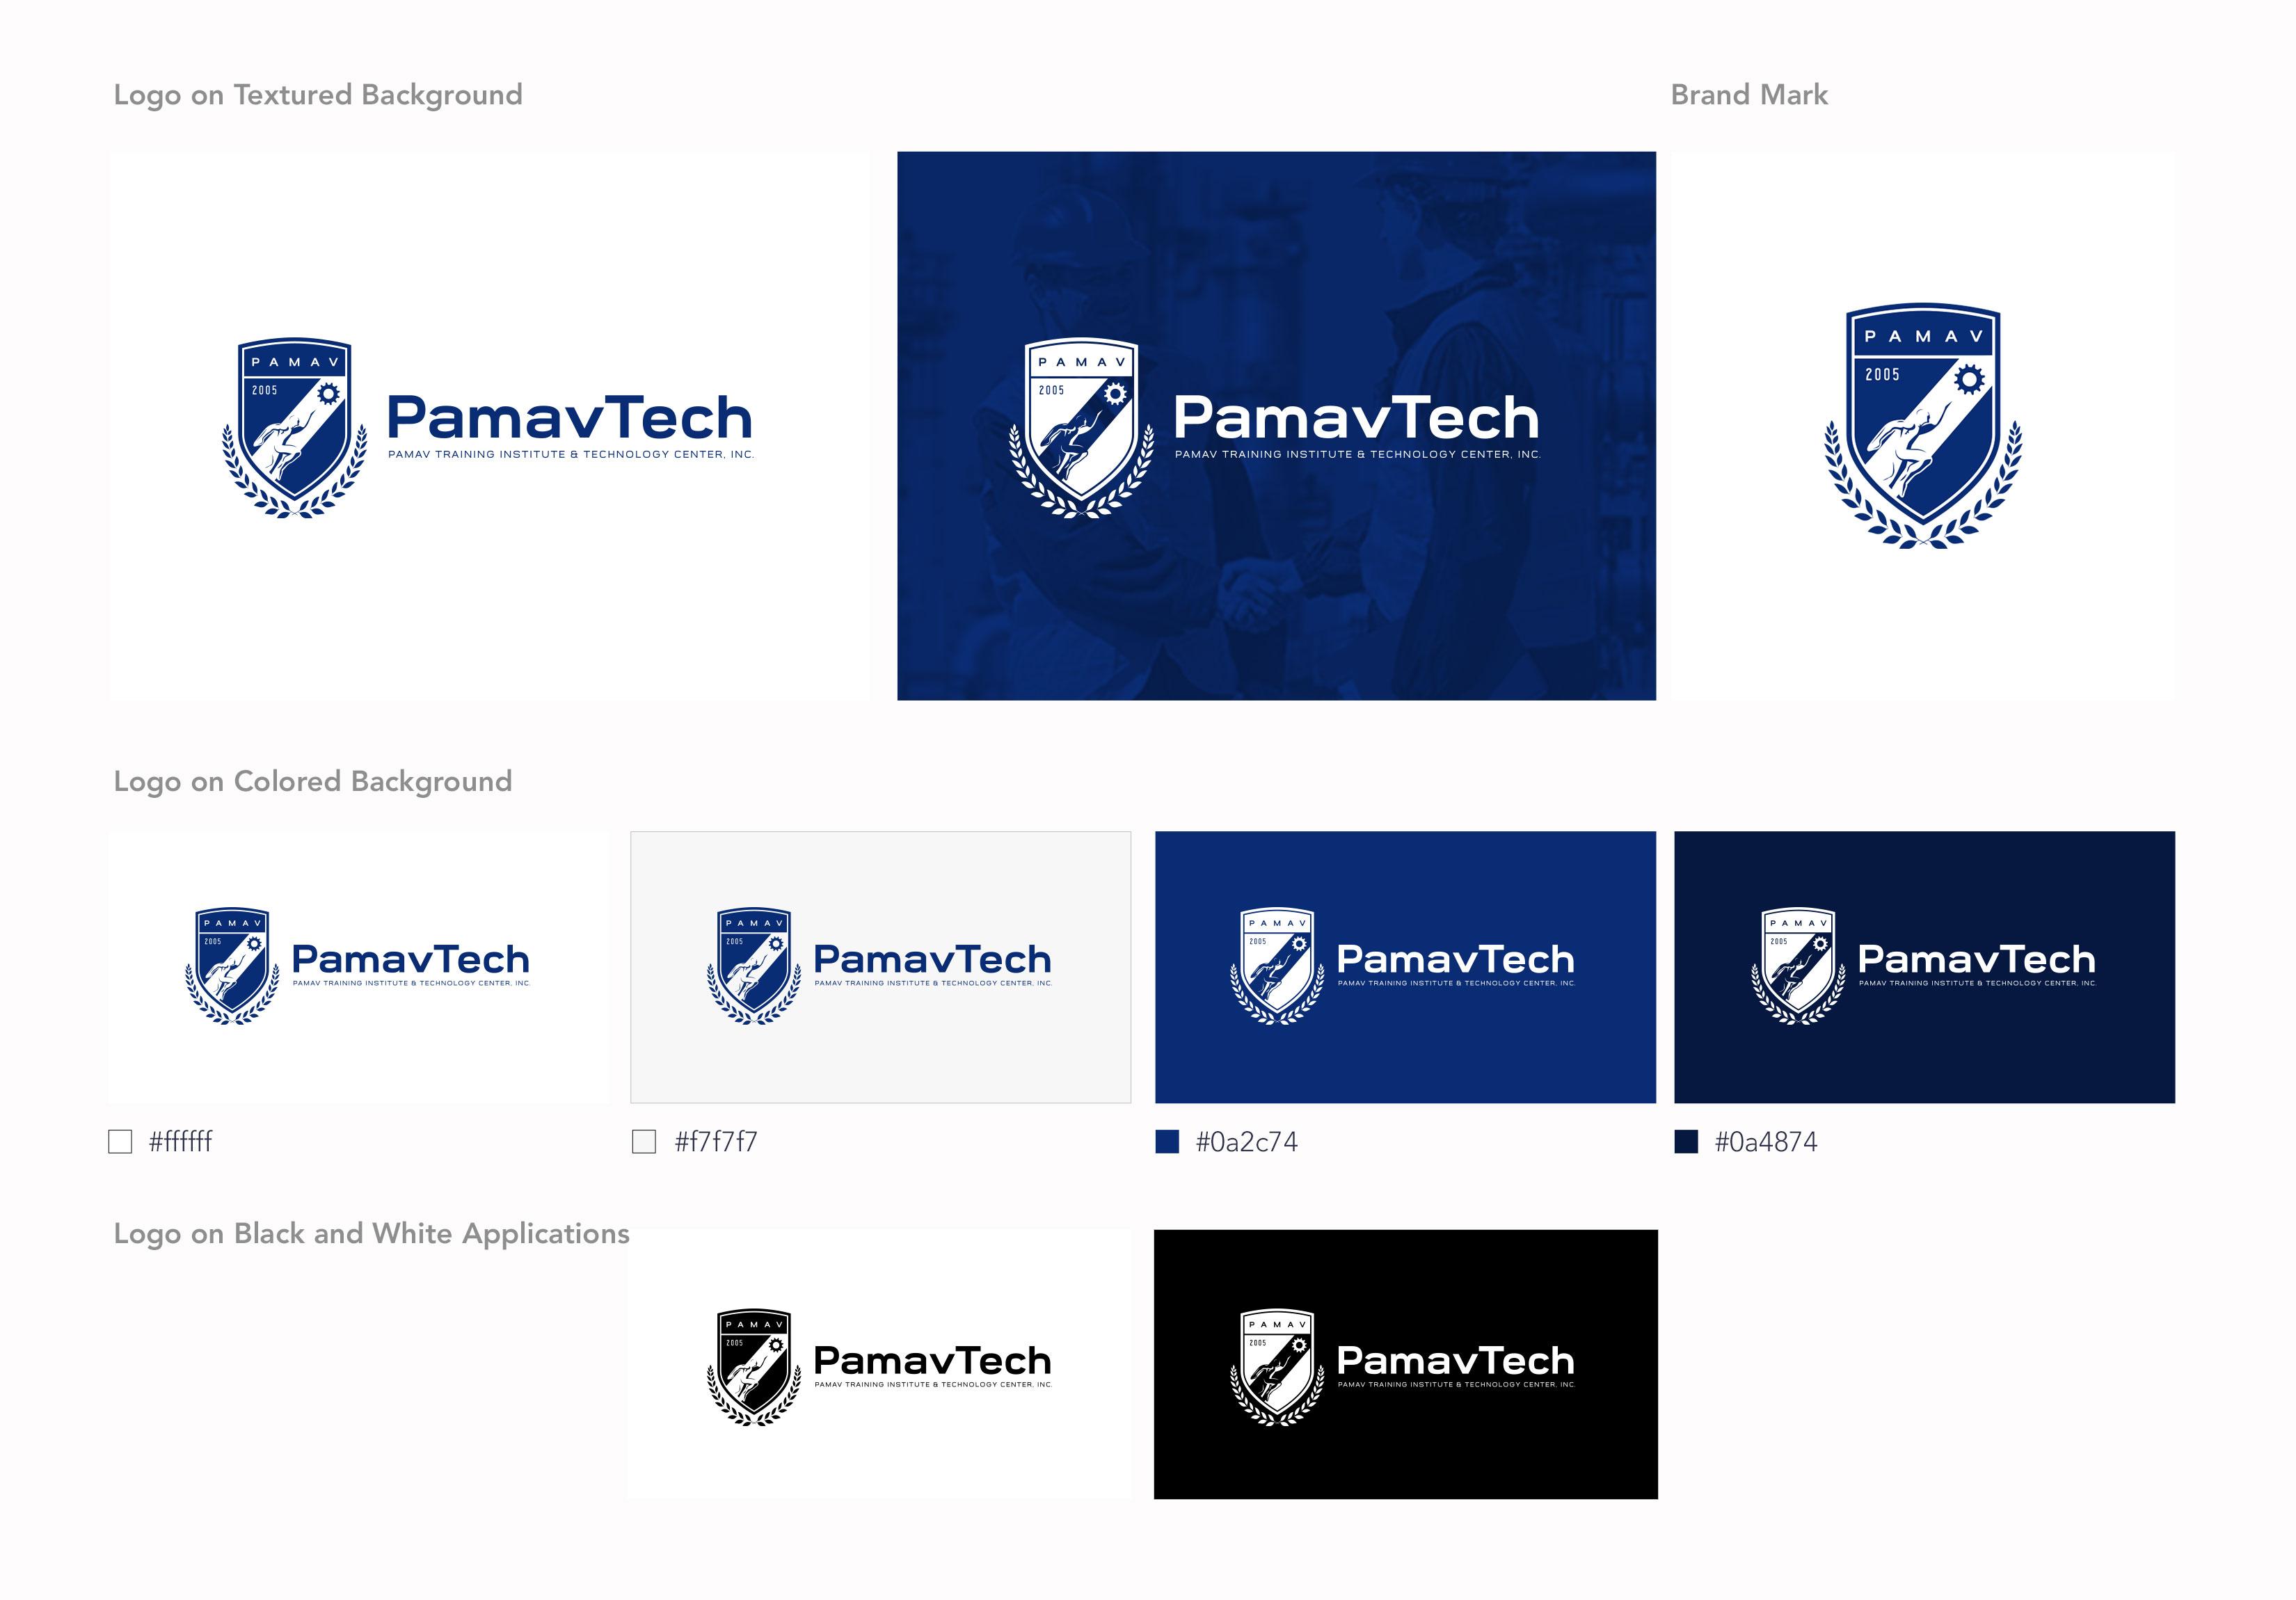 Pamavtech-2-Applications